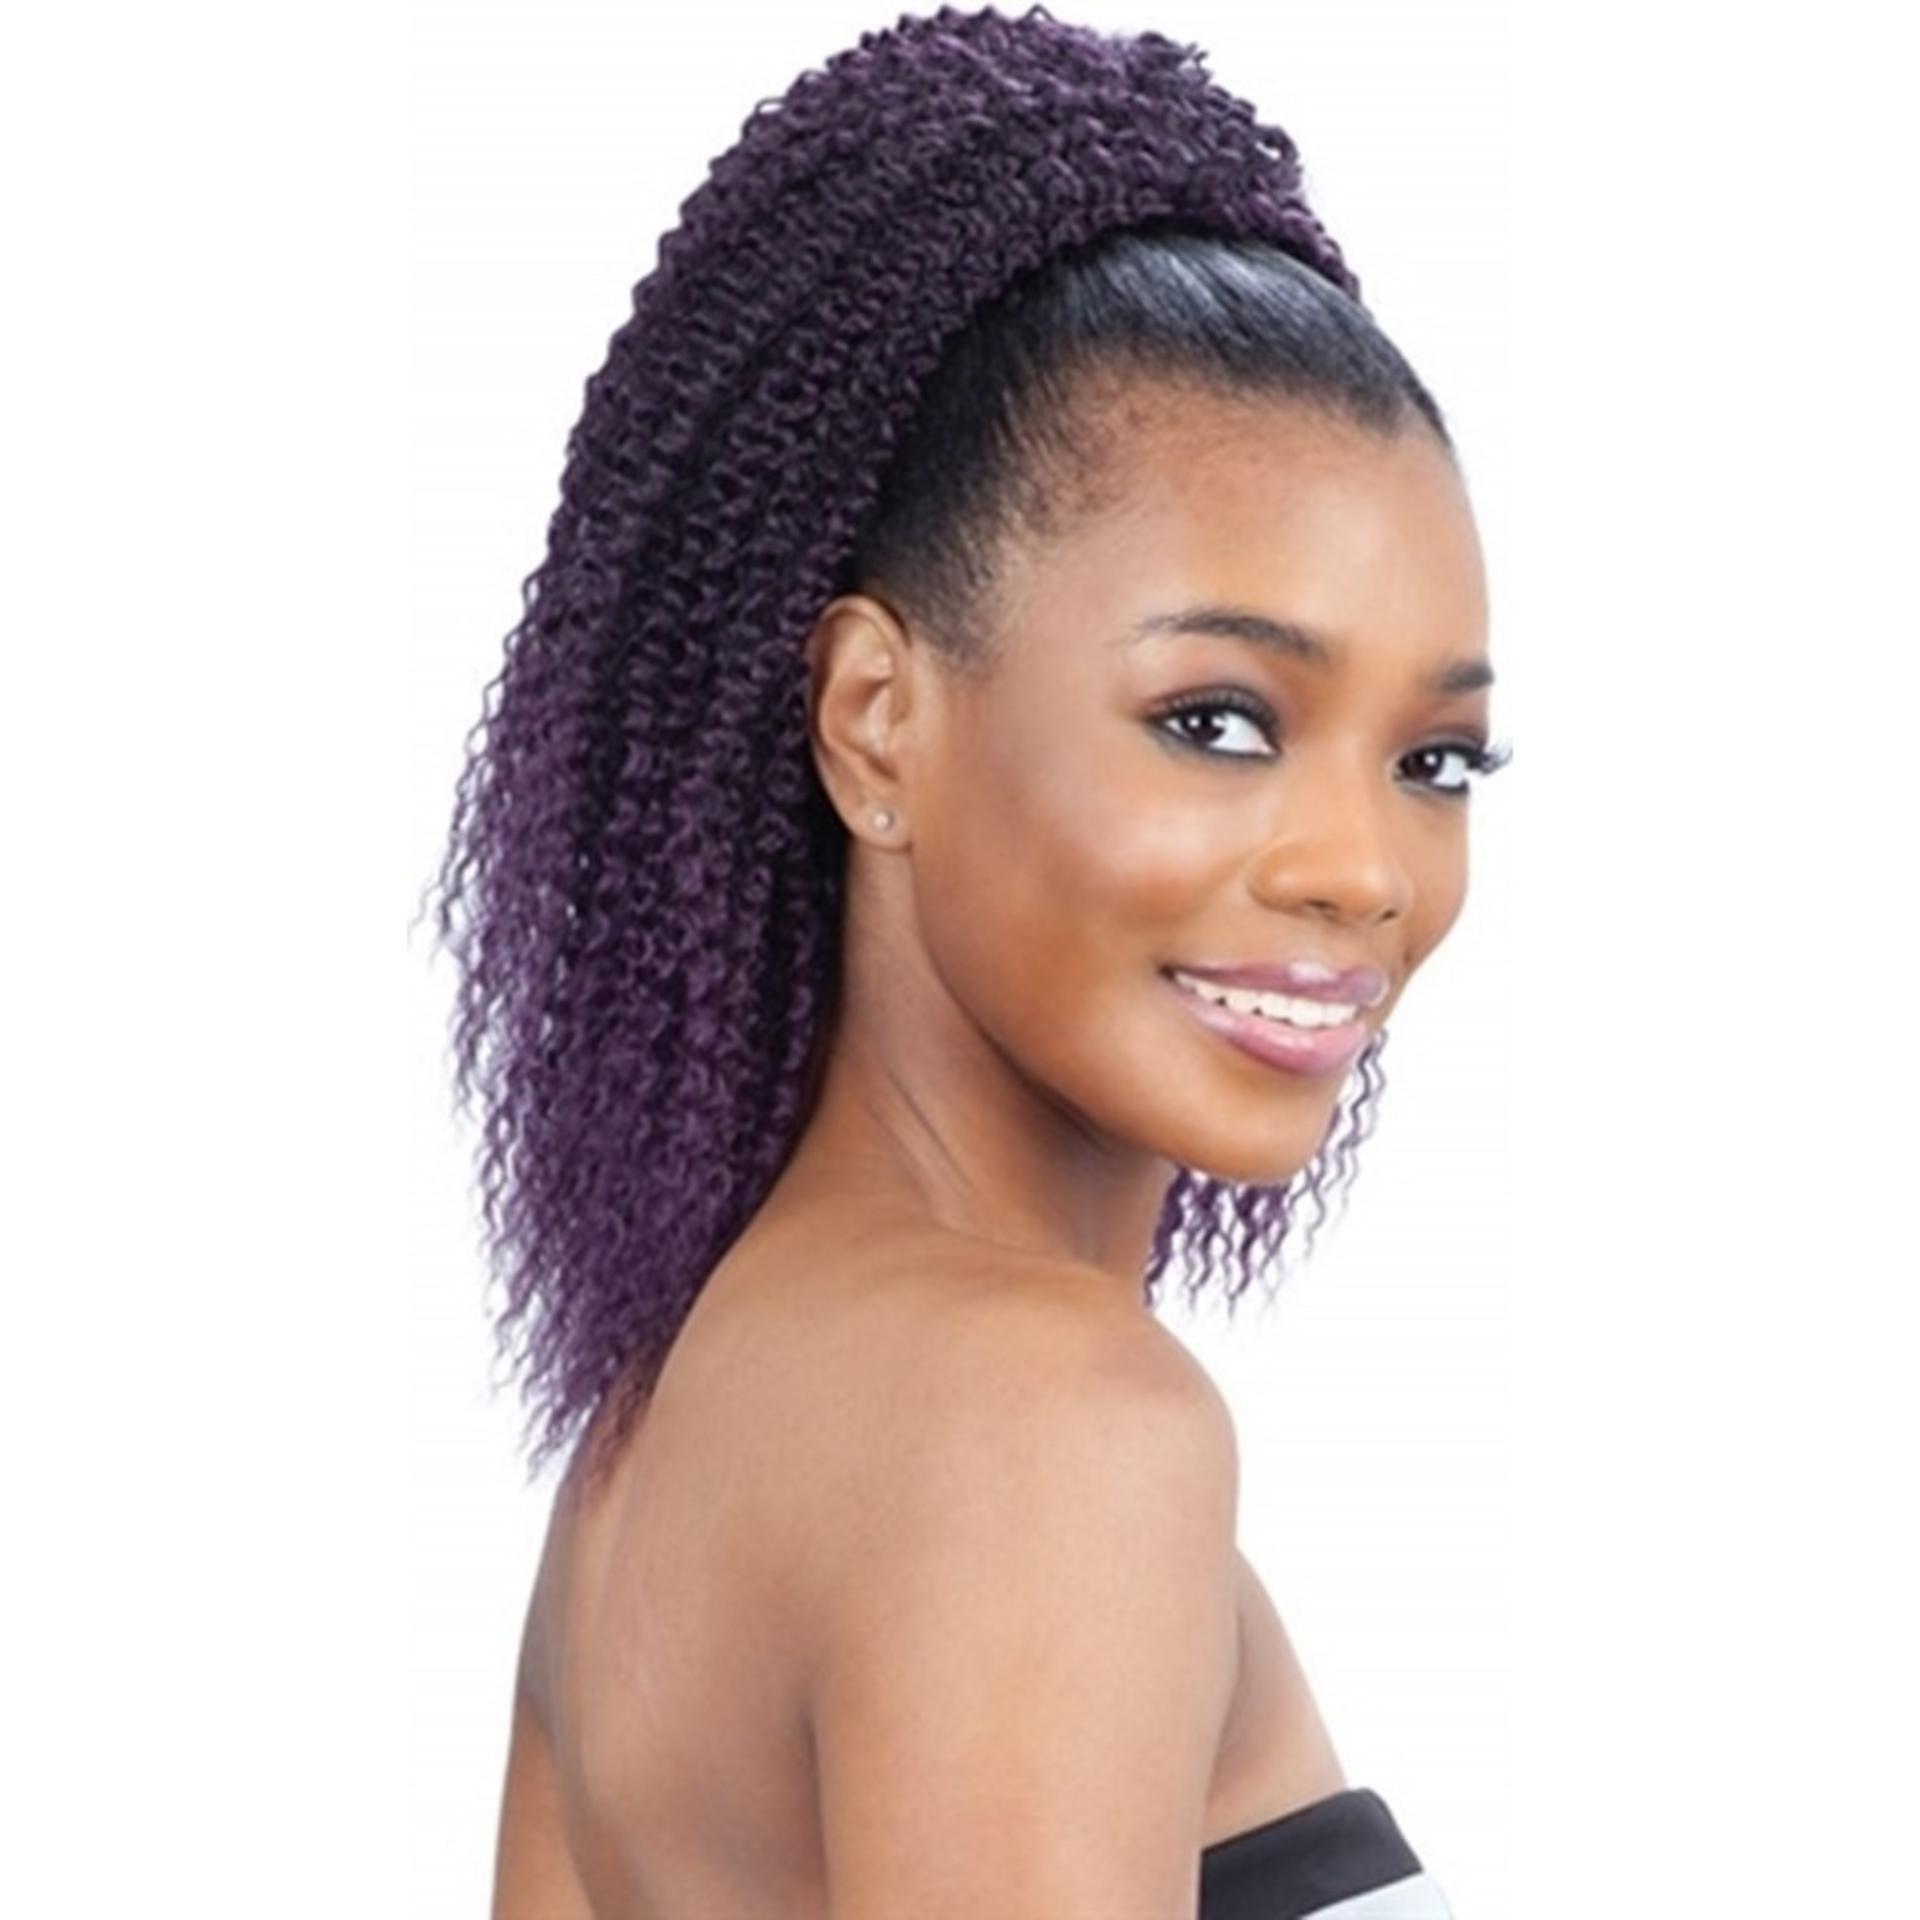 Keep It Stylish - freetress-equal-drawstring-ponytail-brazilian-girl-de7